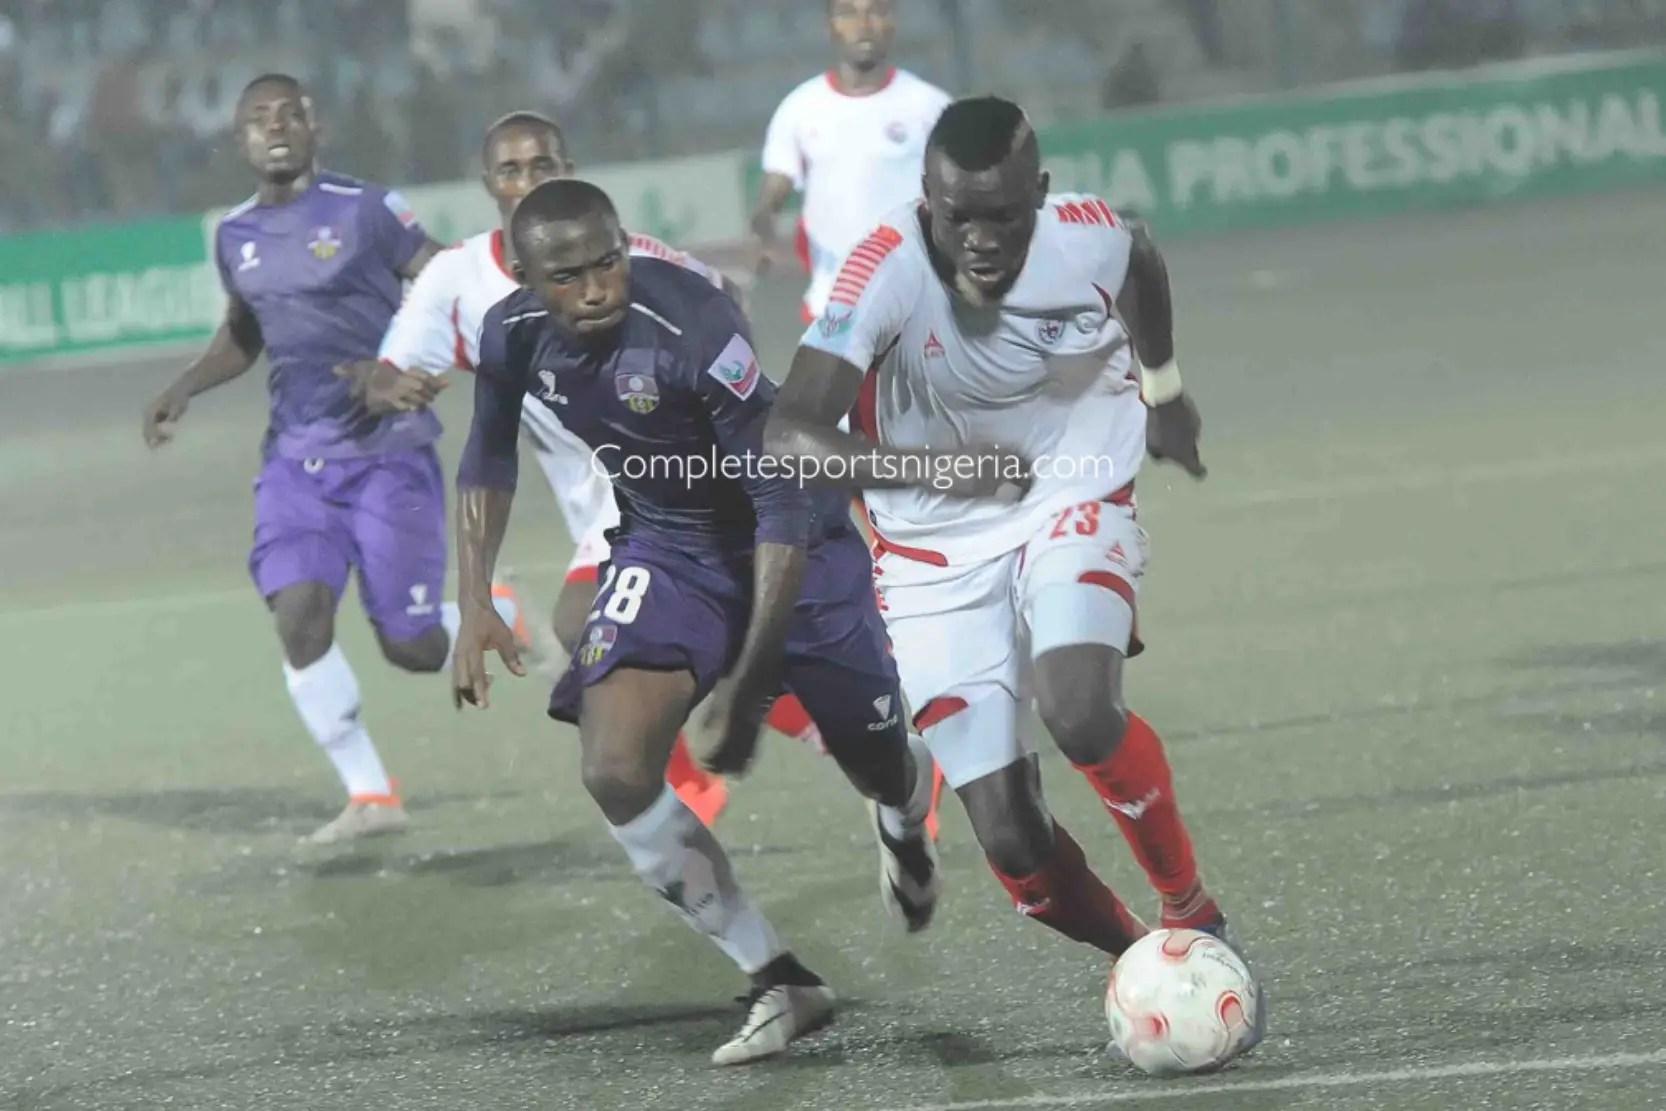 NPFL Matchday-11: Lobi Seek 1st Away Win At Plateau Utd.; Rangers Host ABS, Gun For Lifeline 3rd Win